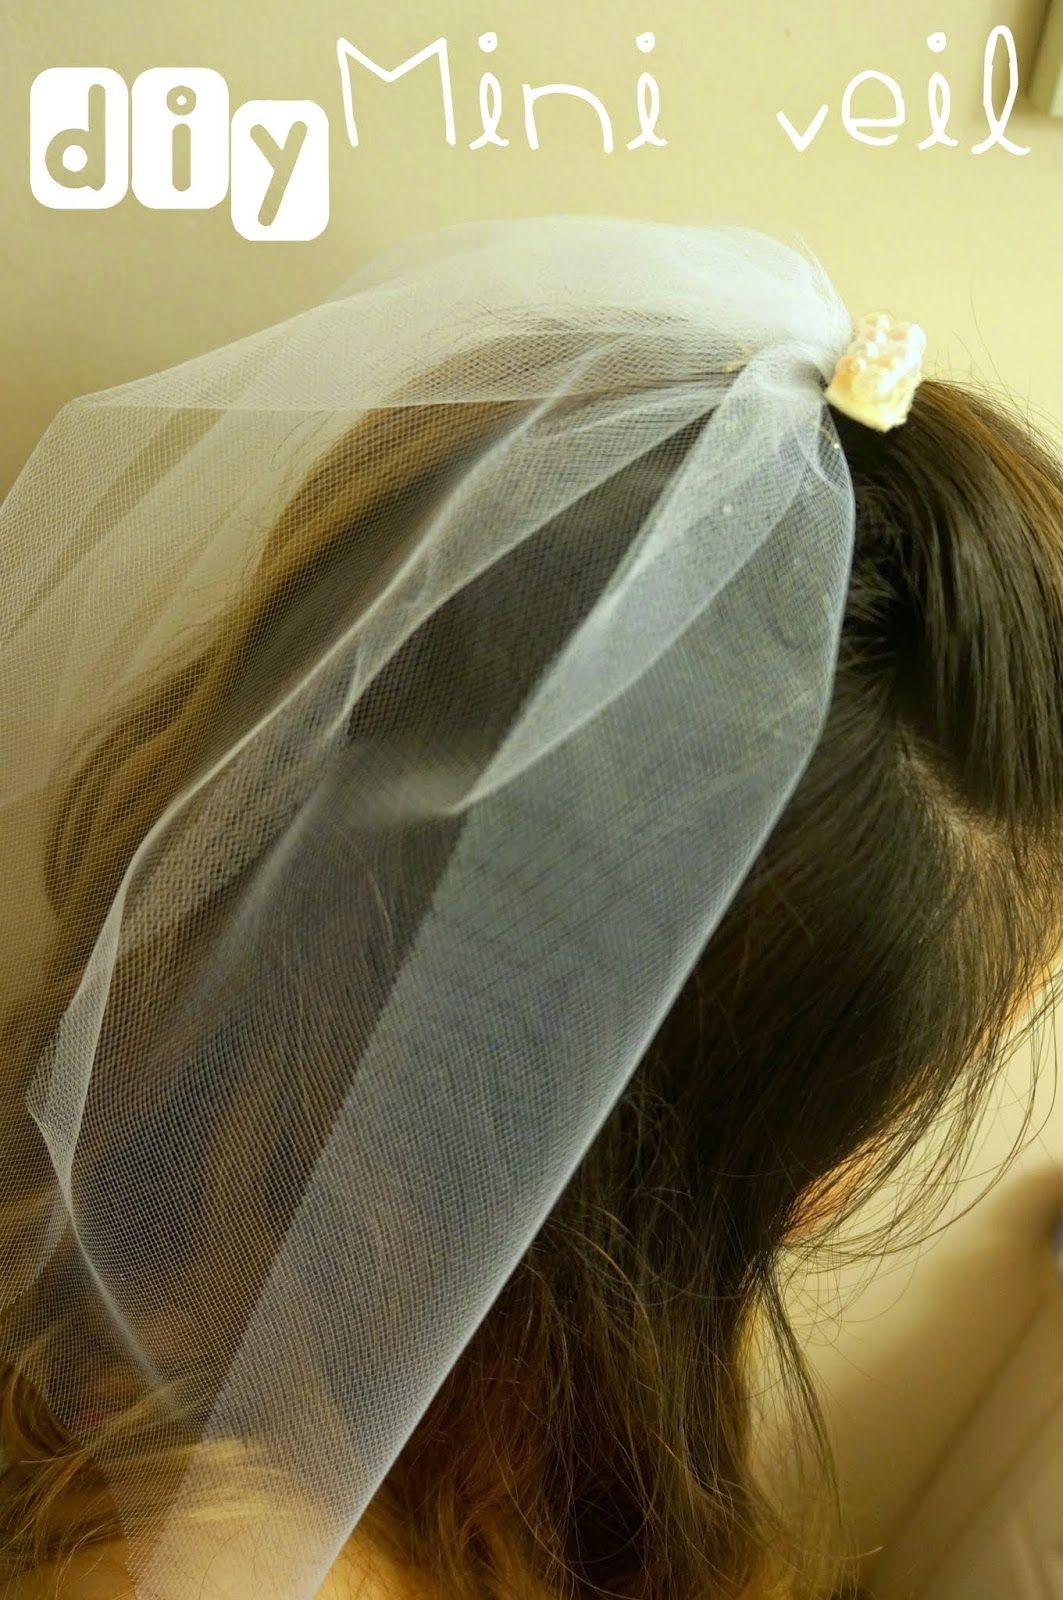 Diy Mini Veil Cute Kitschy Craft Idea For A Bachelorette Party Or Bridal Shower